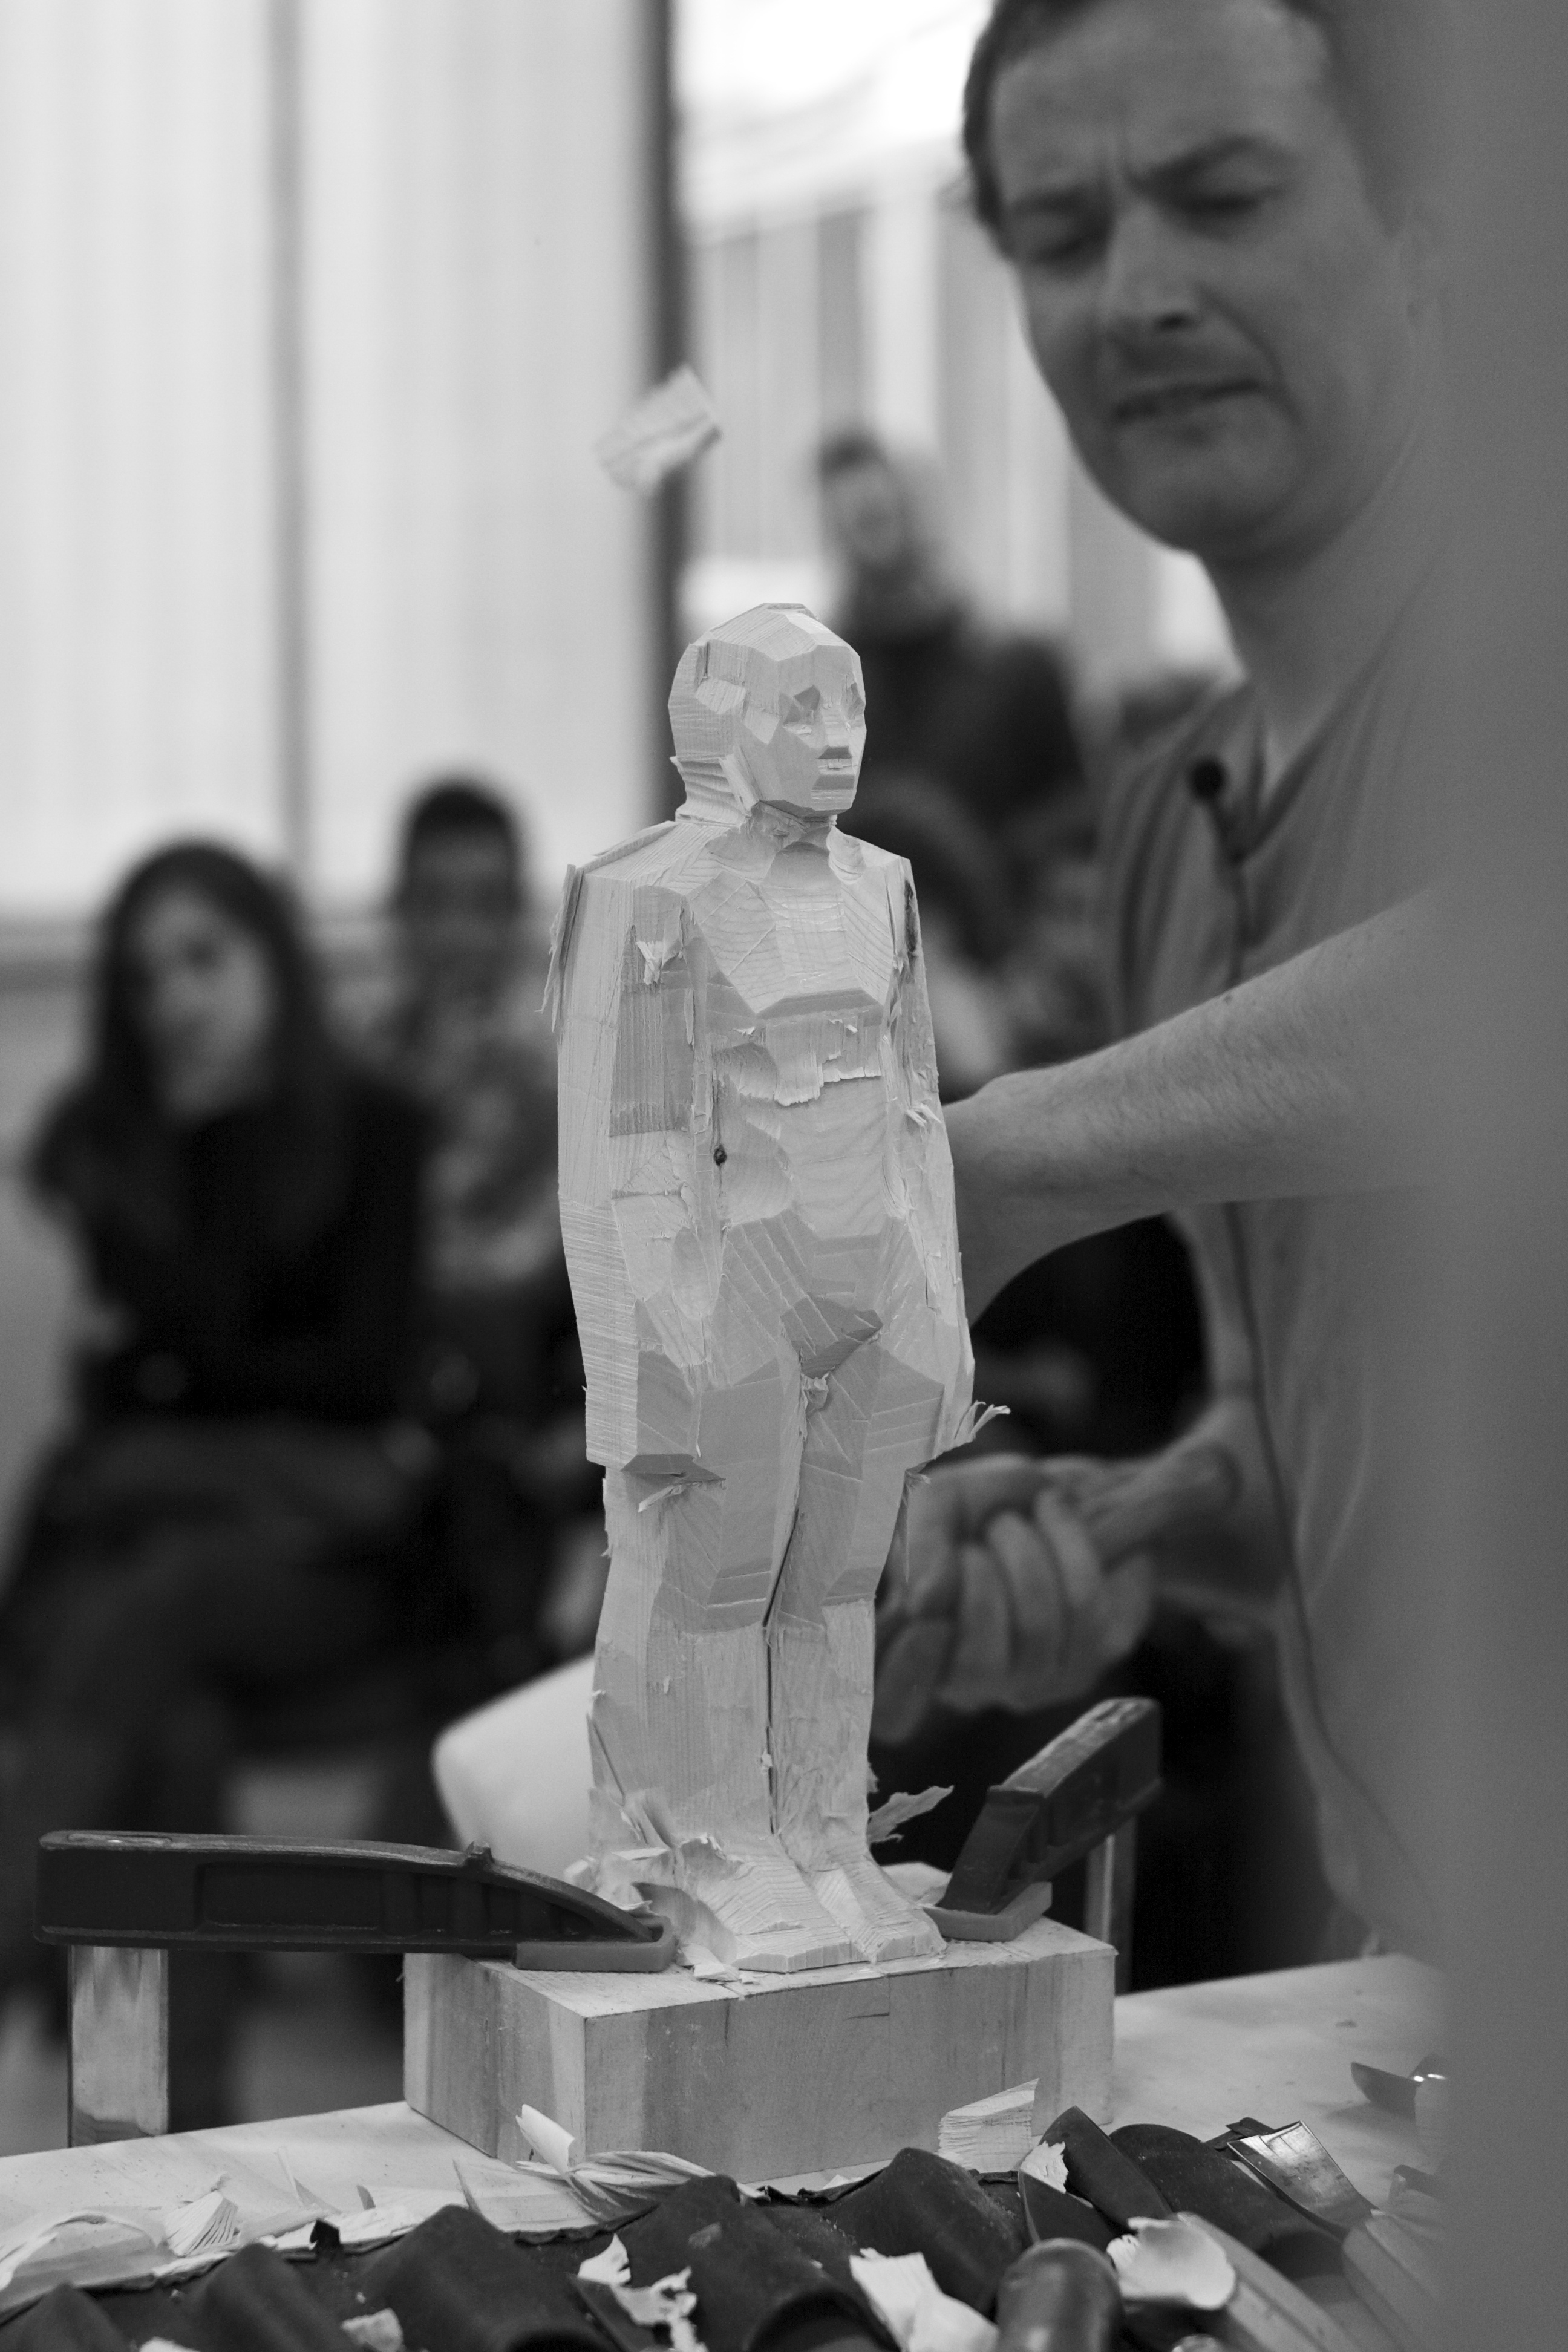 Flickr - Aron Demetz - Dialoghi e materia - Workshop a cura di Franco Reina79